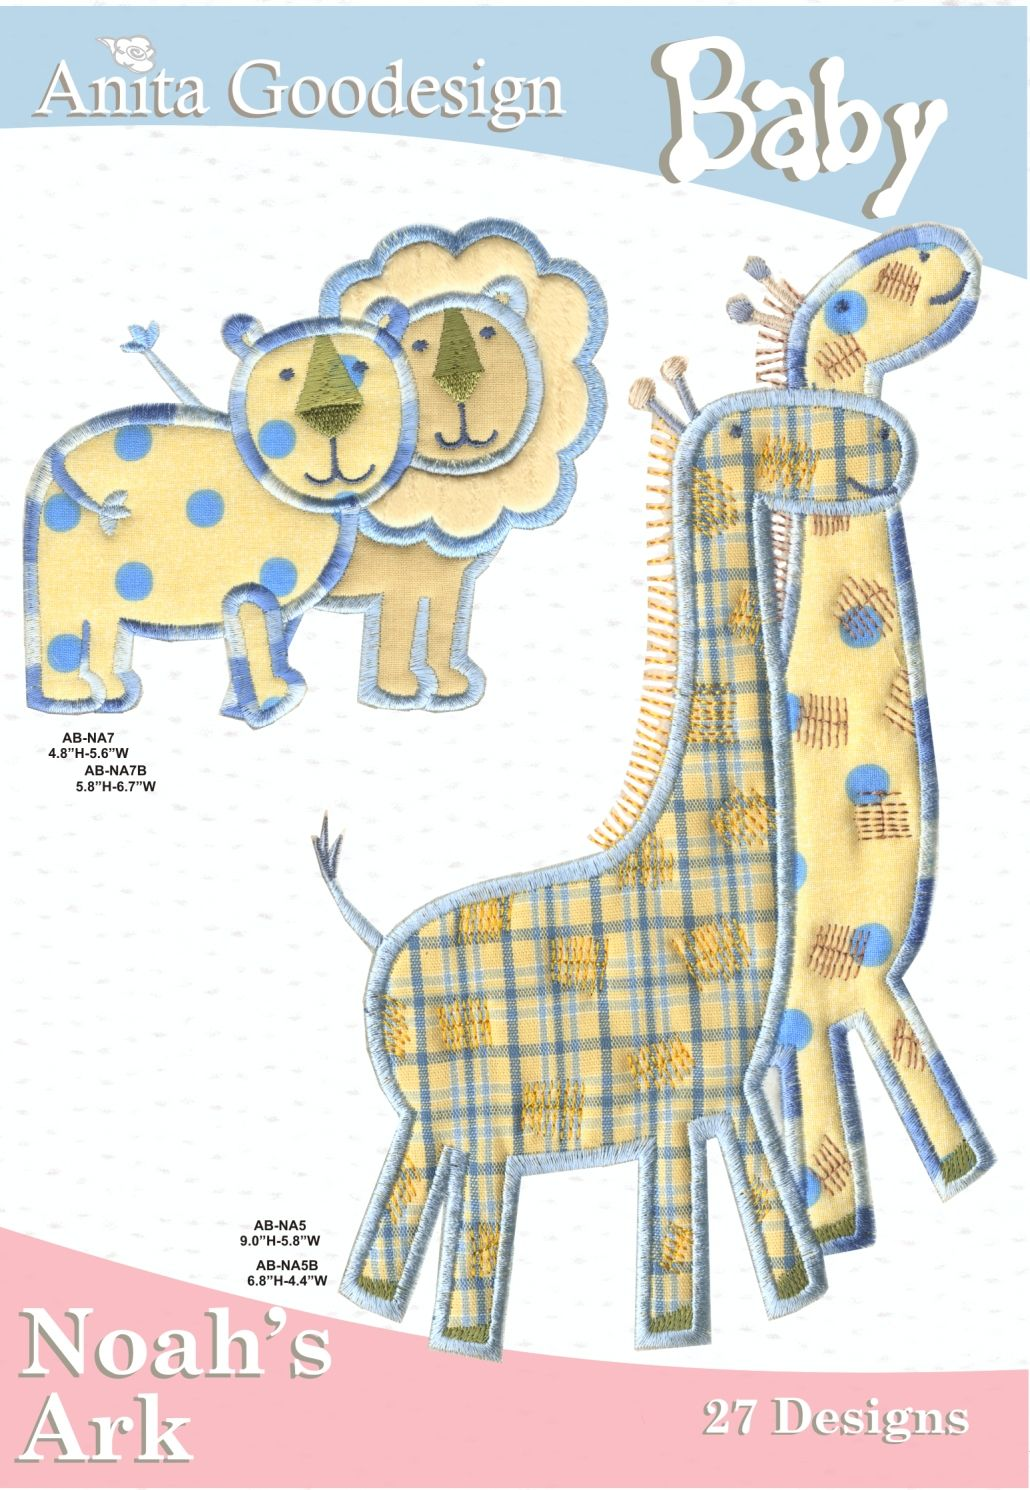 Anita Goodesign Baby Noah S Ark